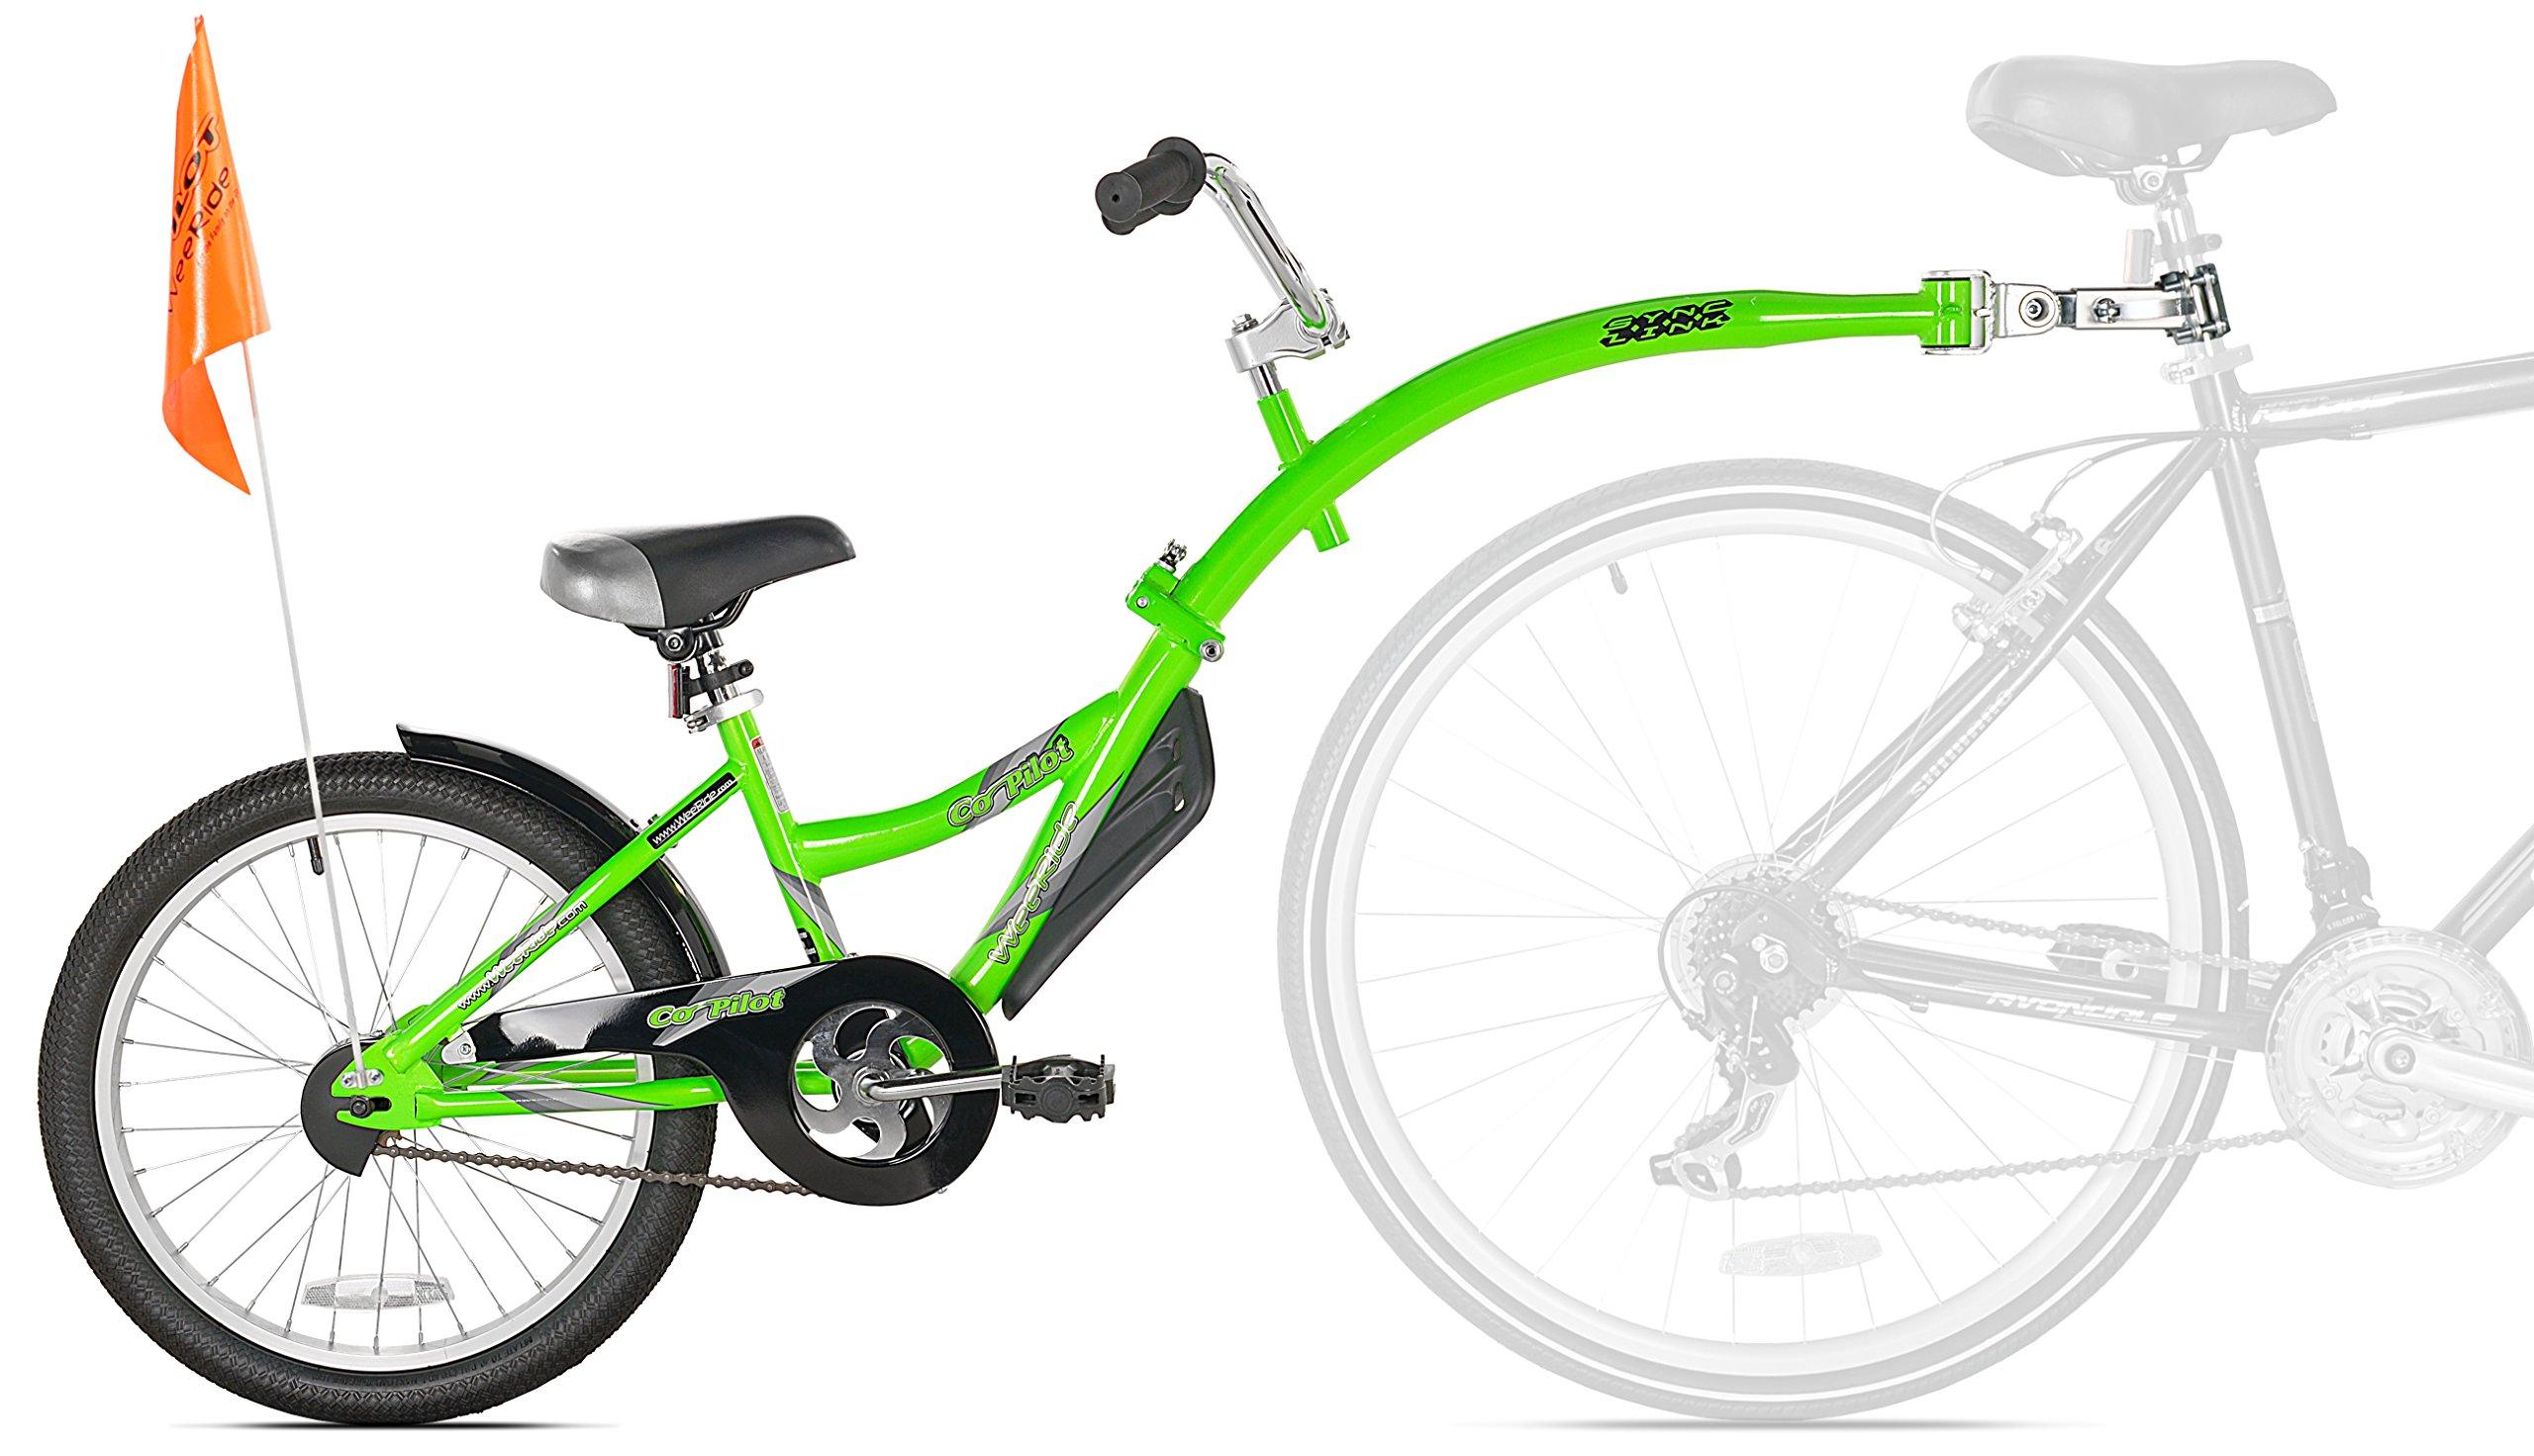 WeeRide 86457 Bicicleta Remolque Copilot, Niños, Verde, M product image